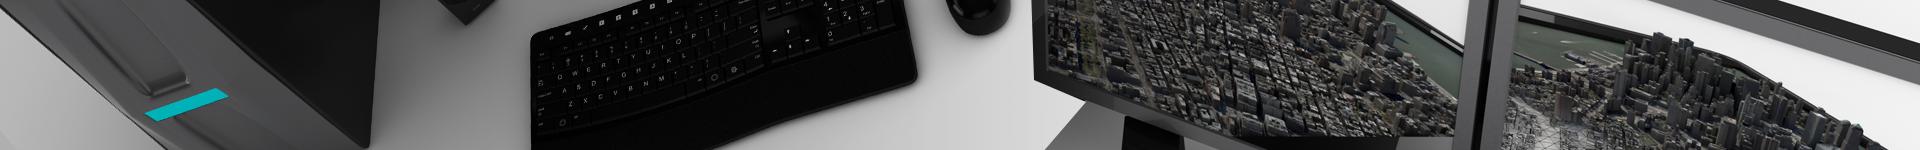 Компьютеры и моноблоки